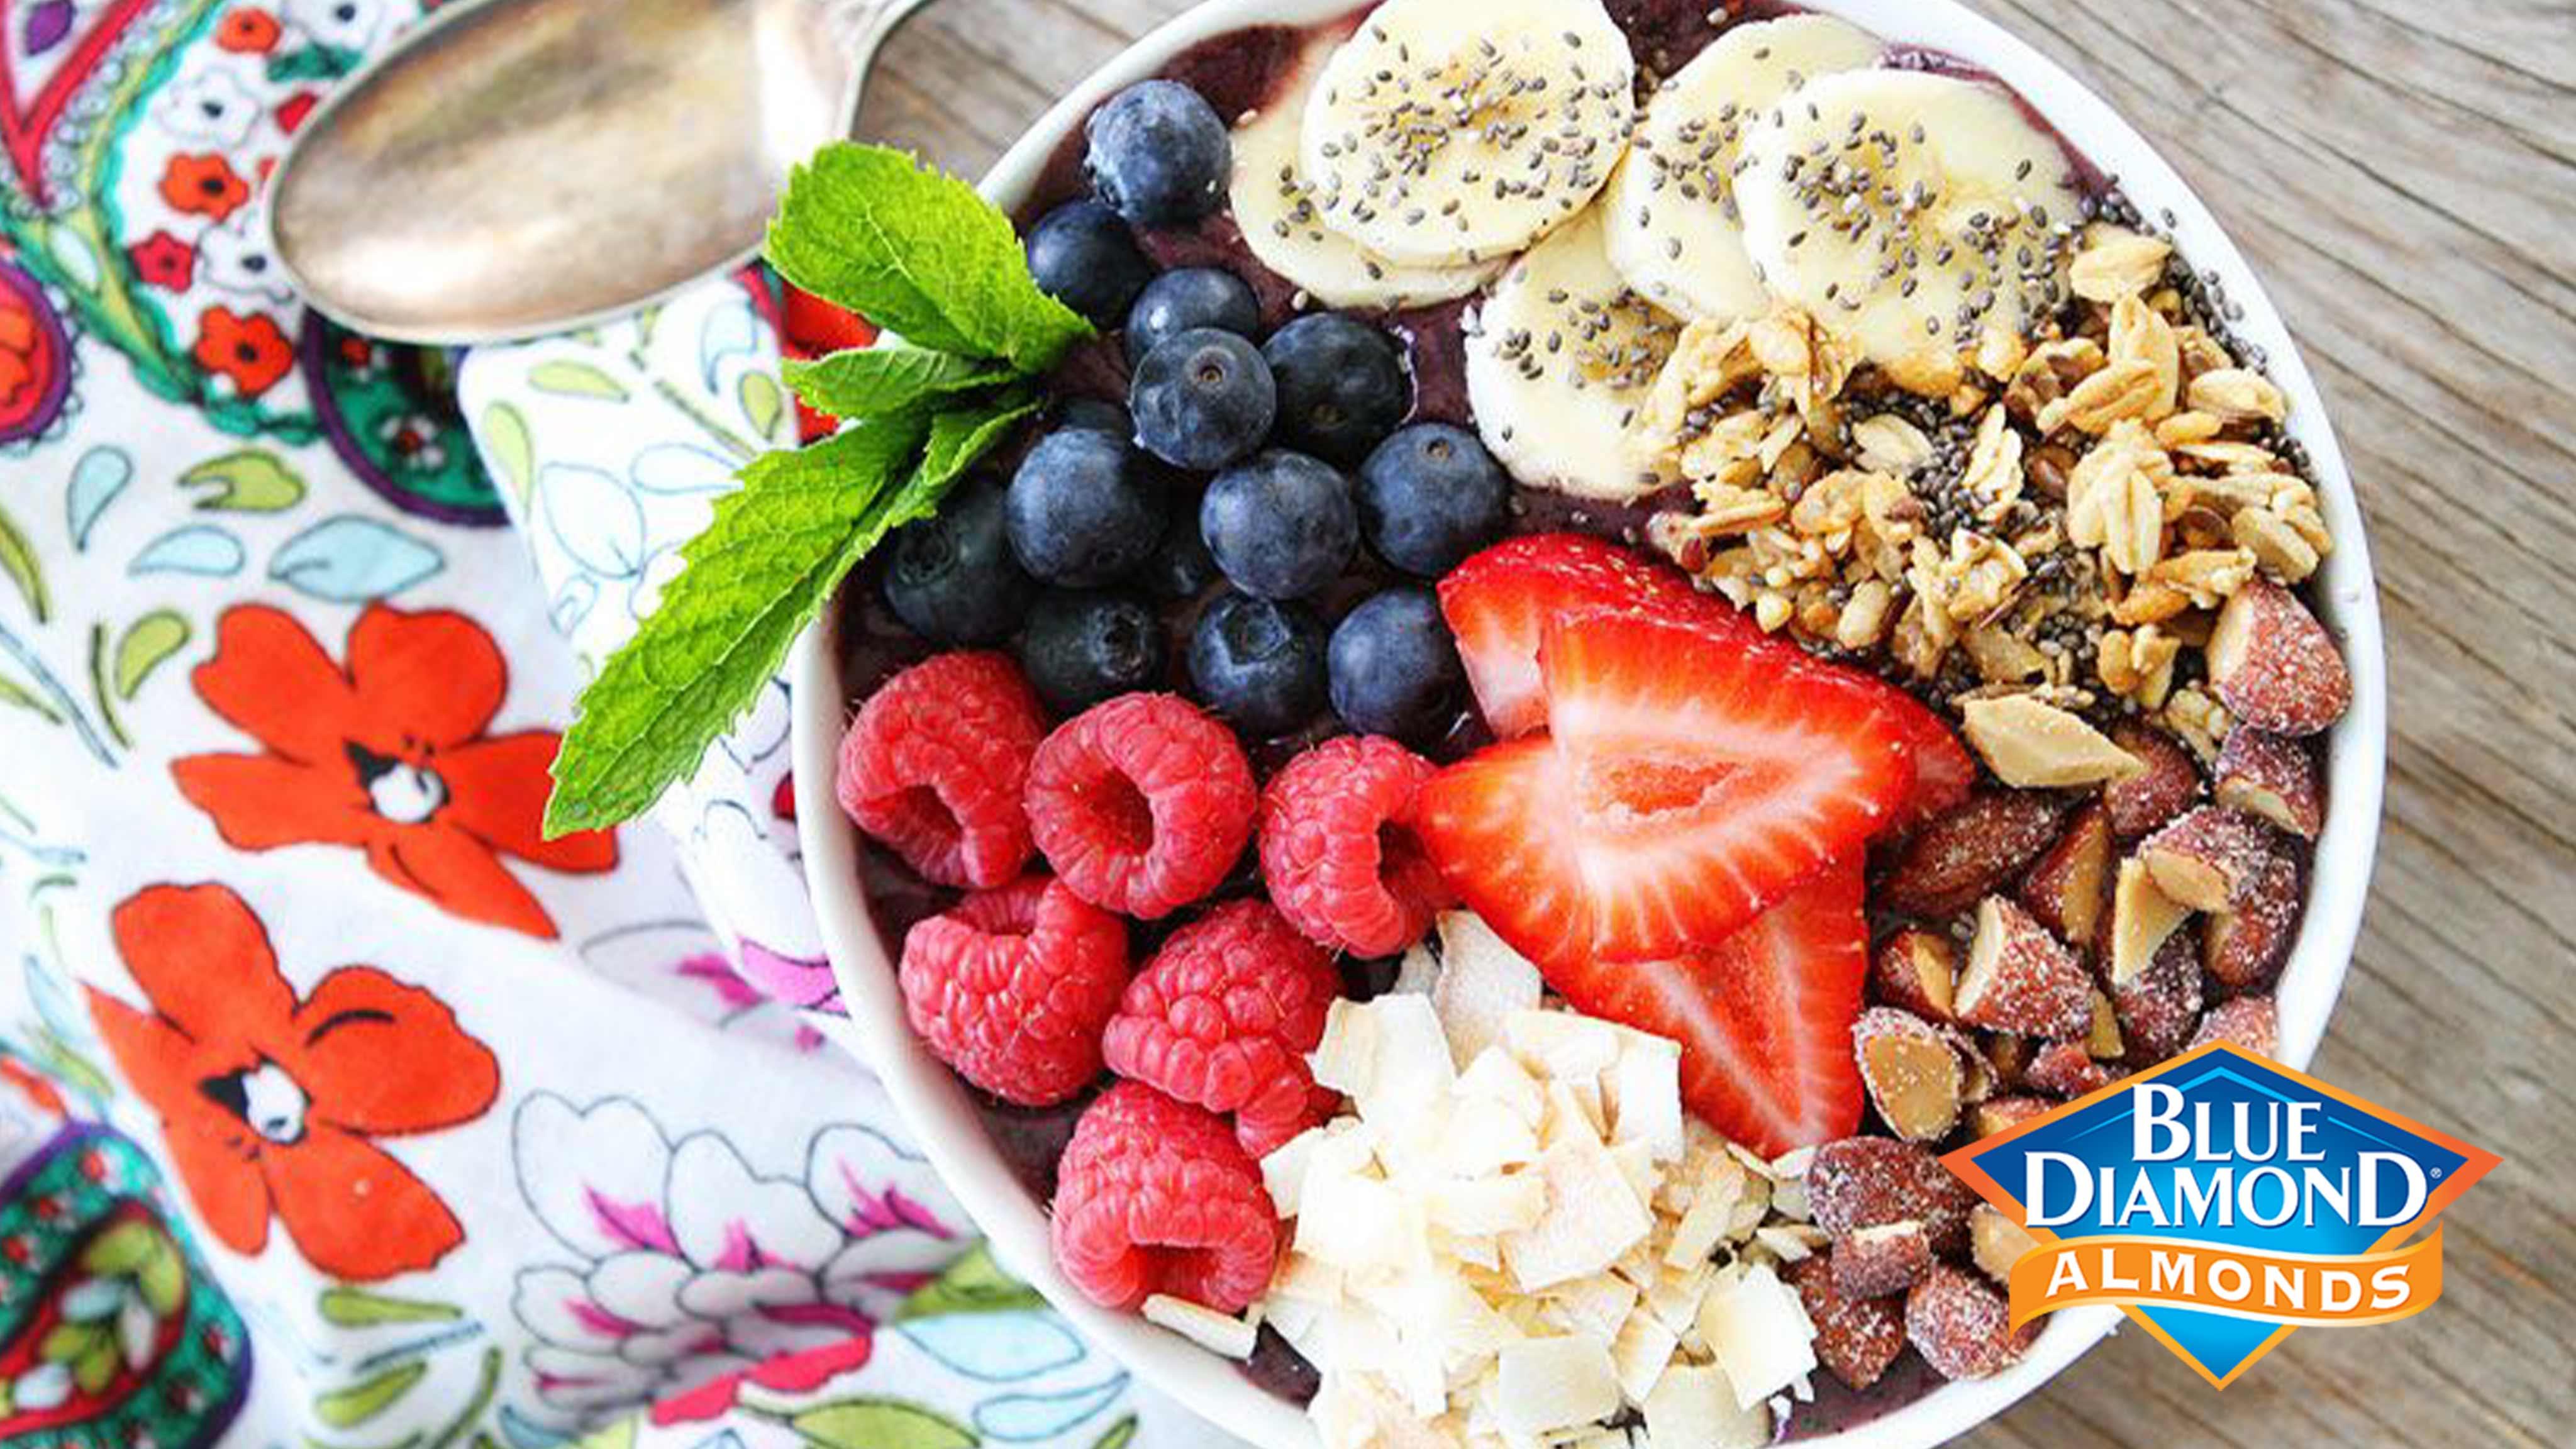 Image for Recipe Berry Banana Smoothie Bowl